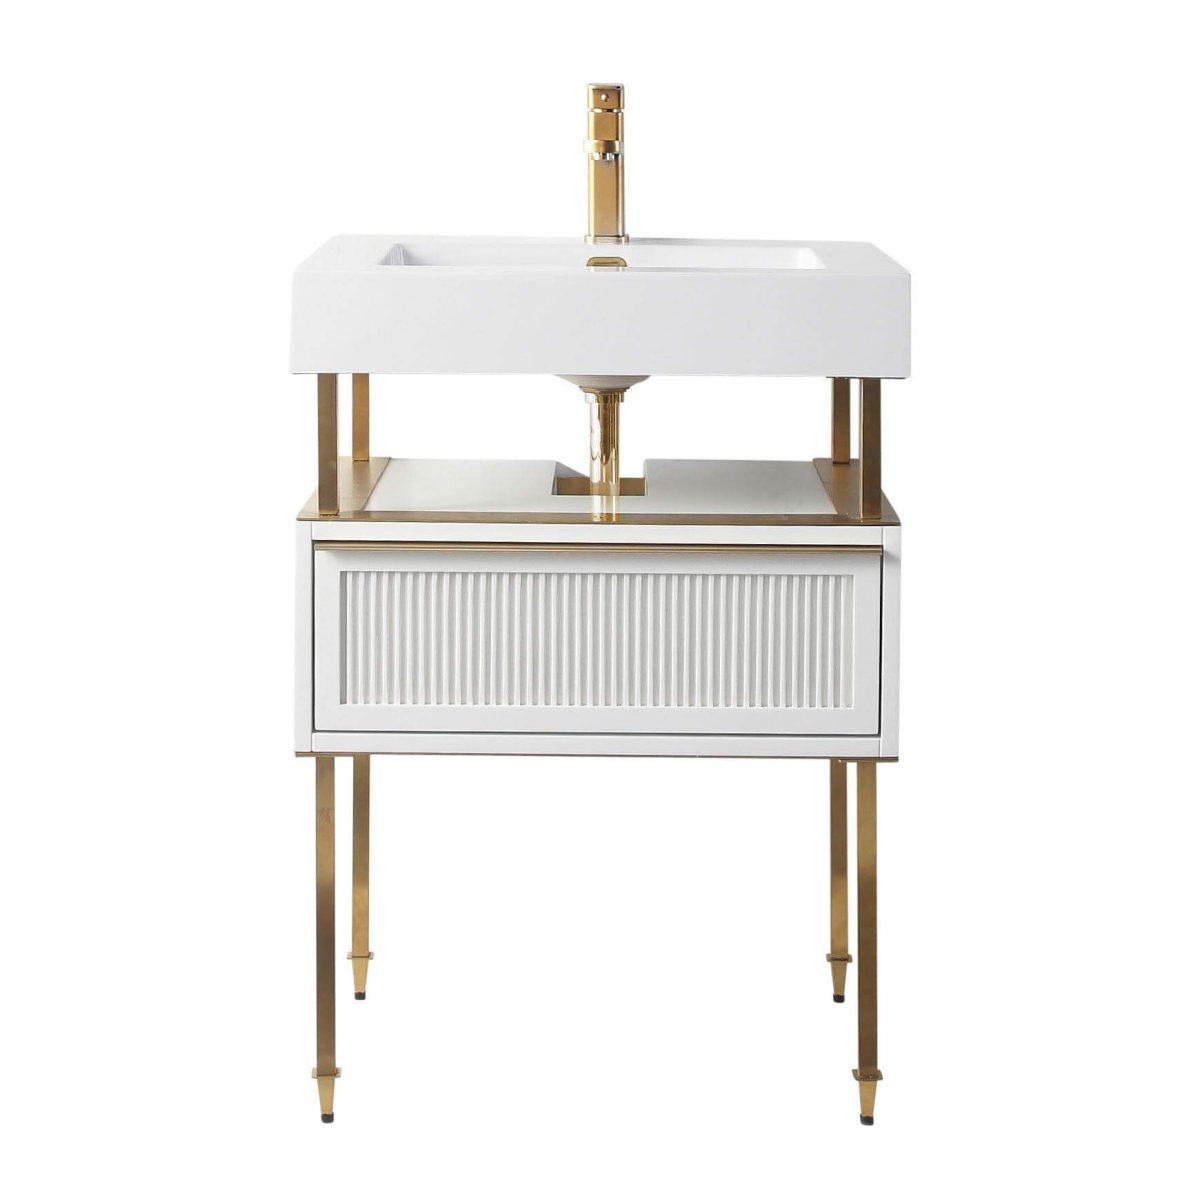 "Dakota 24"" Modern Bathroom Vanity  White with Satin Bras Hardware"